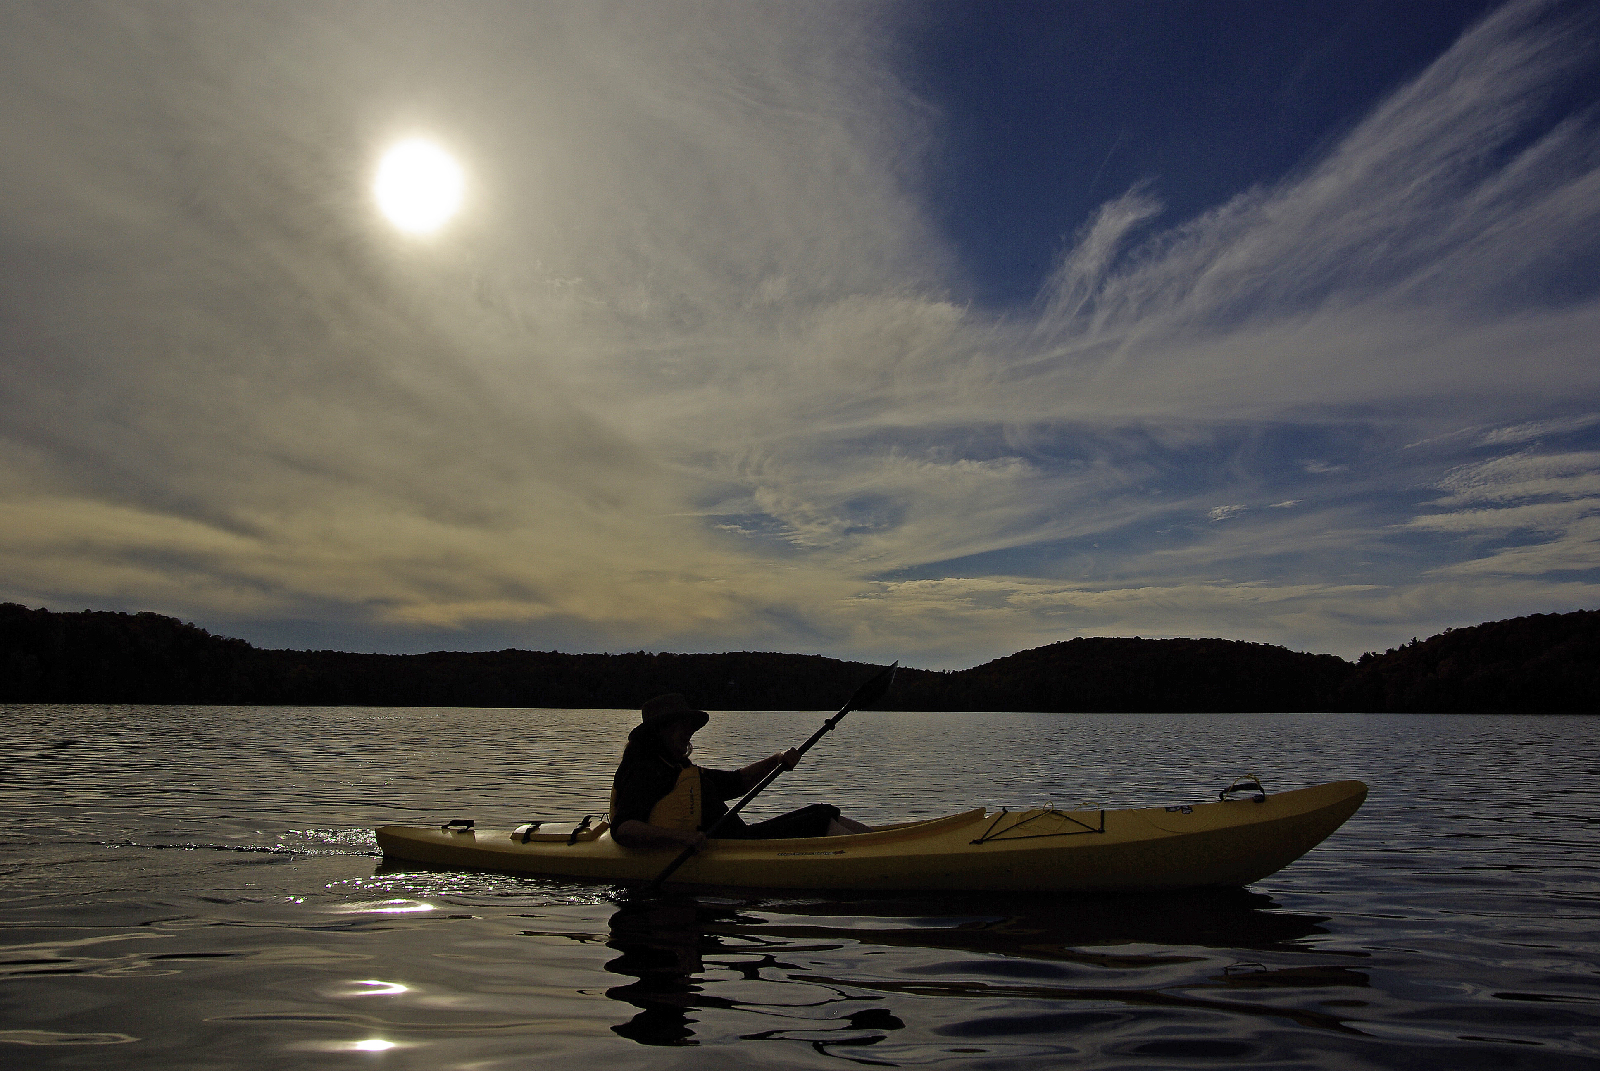 Annette and her kayak, Miskwabi Lake, Haliburton Ontario.